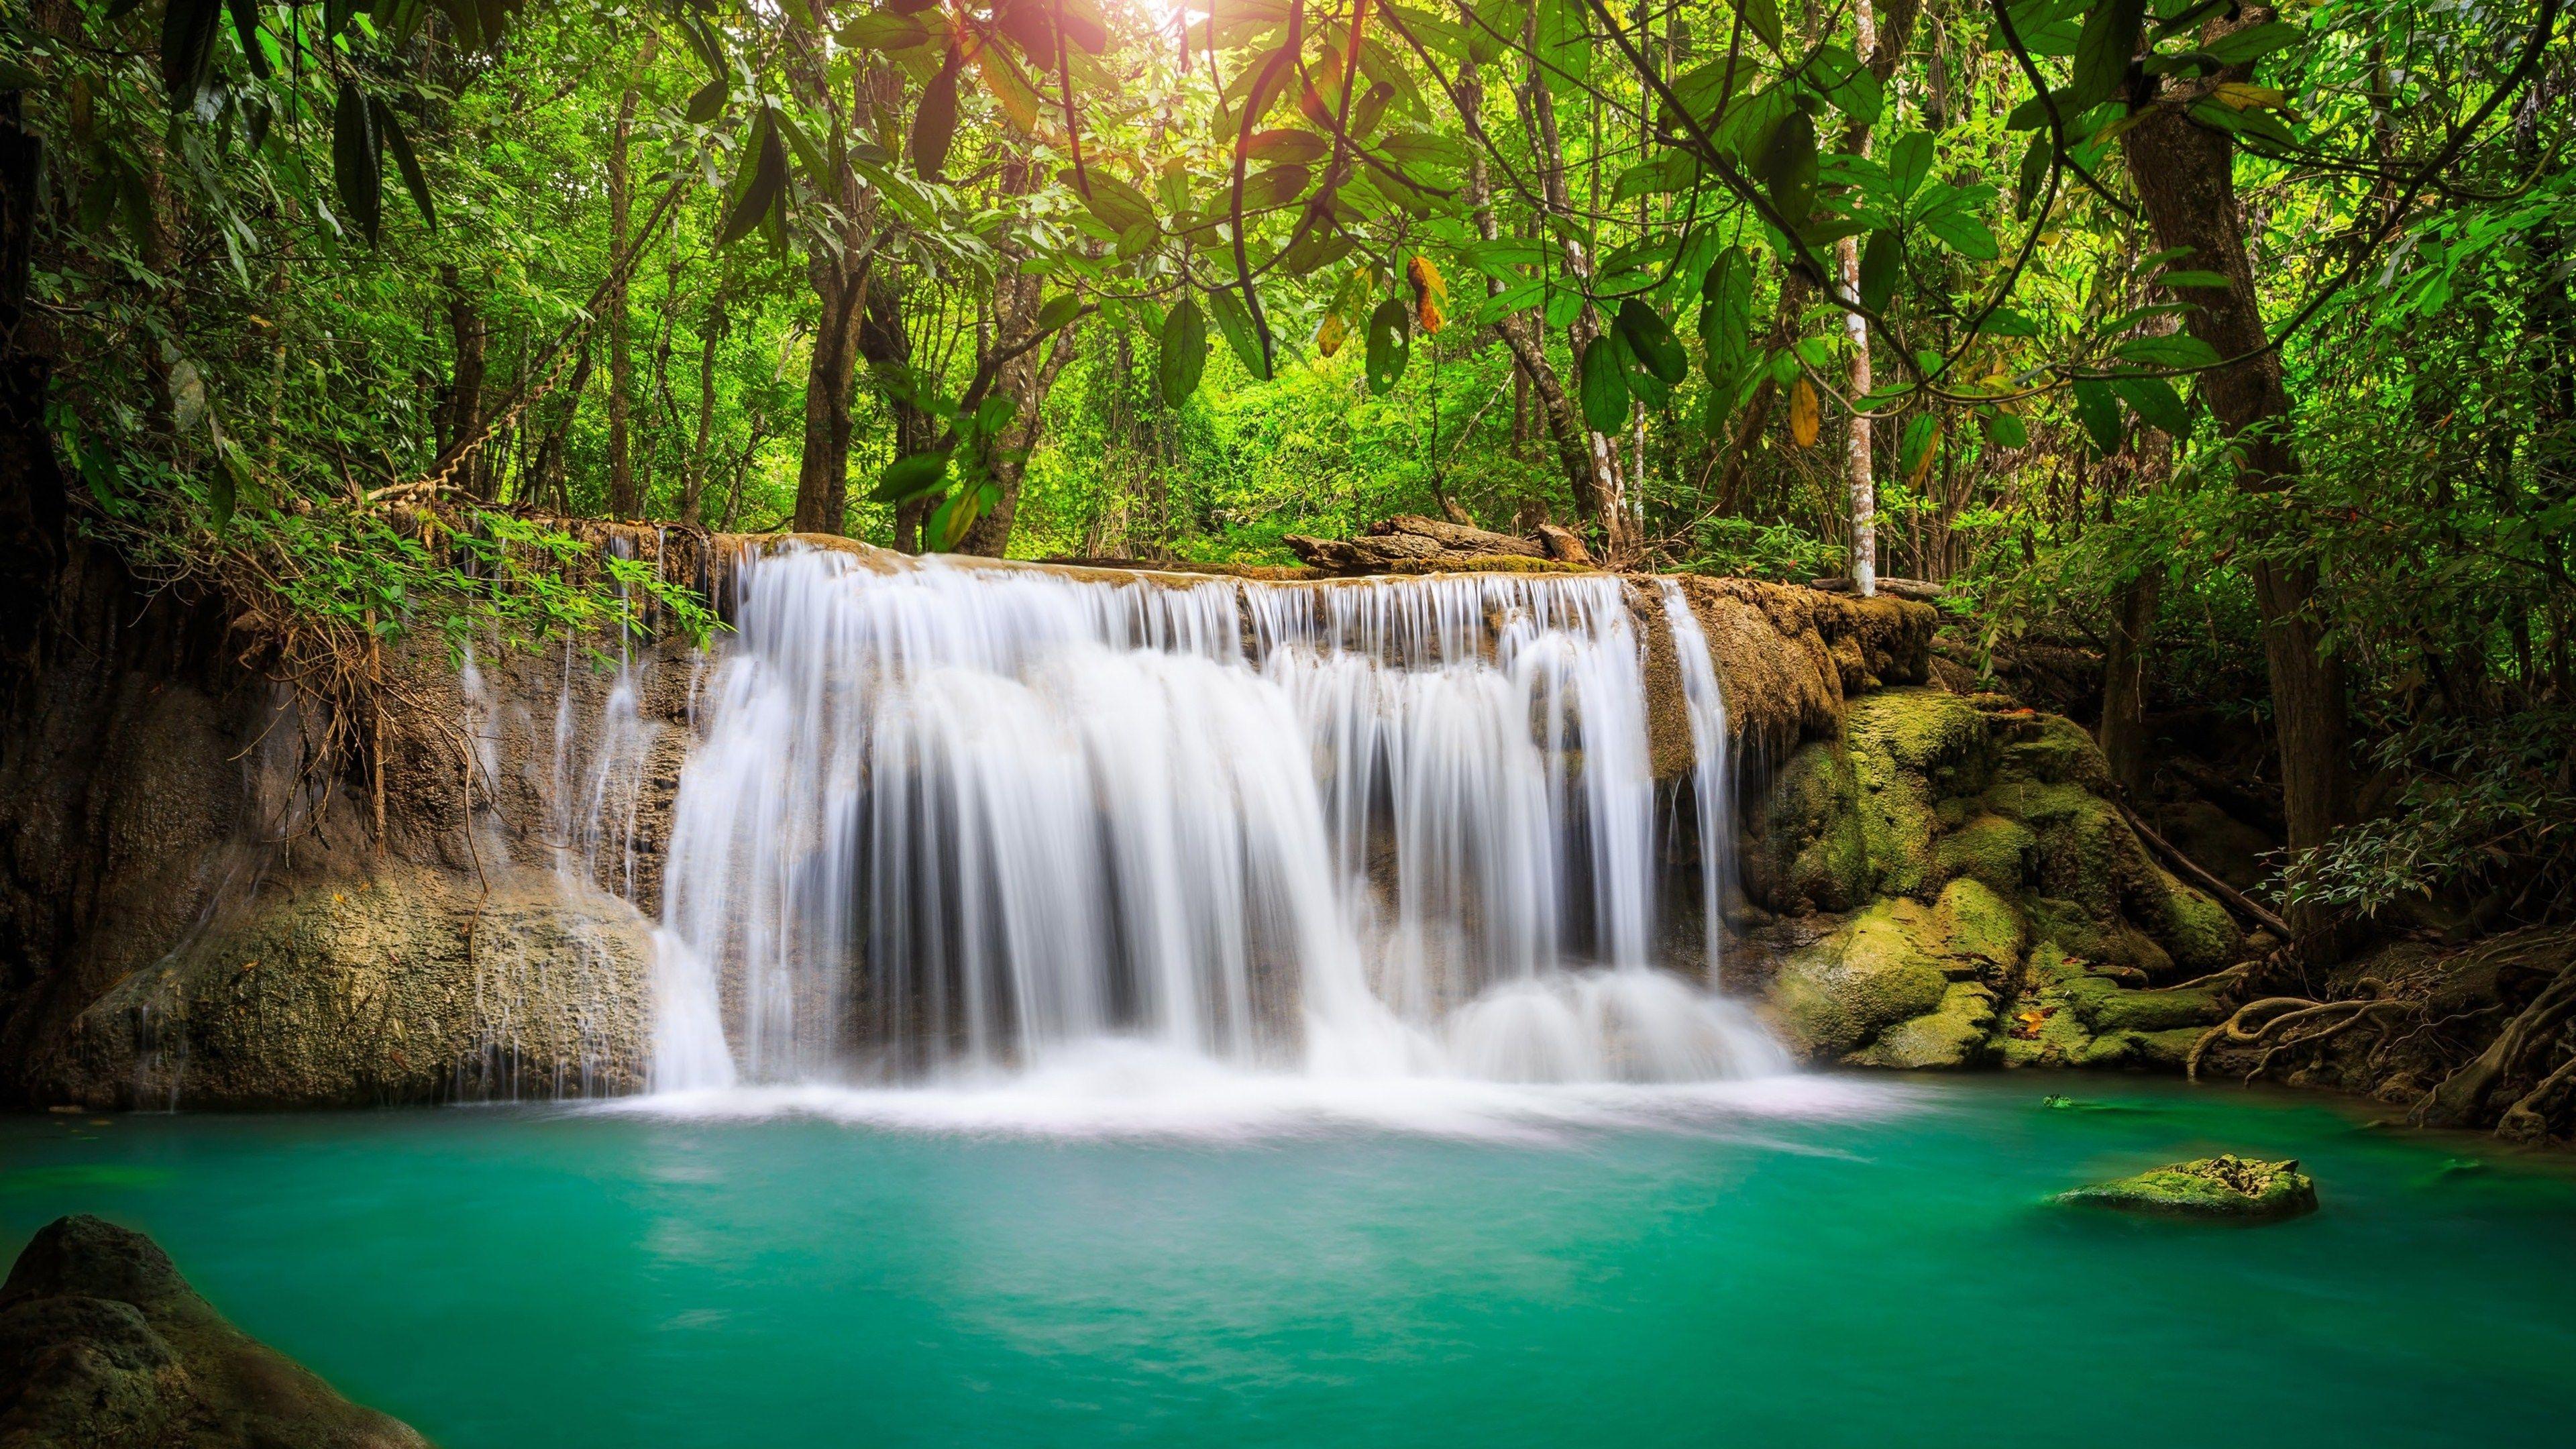 Waterfall #4K Wallpaper (3840X2160)